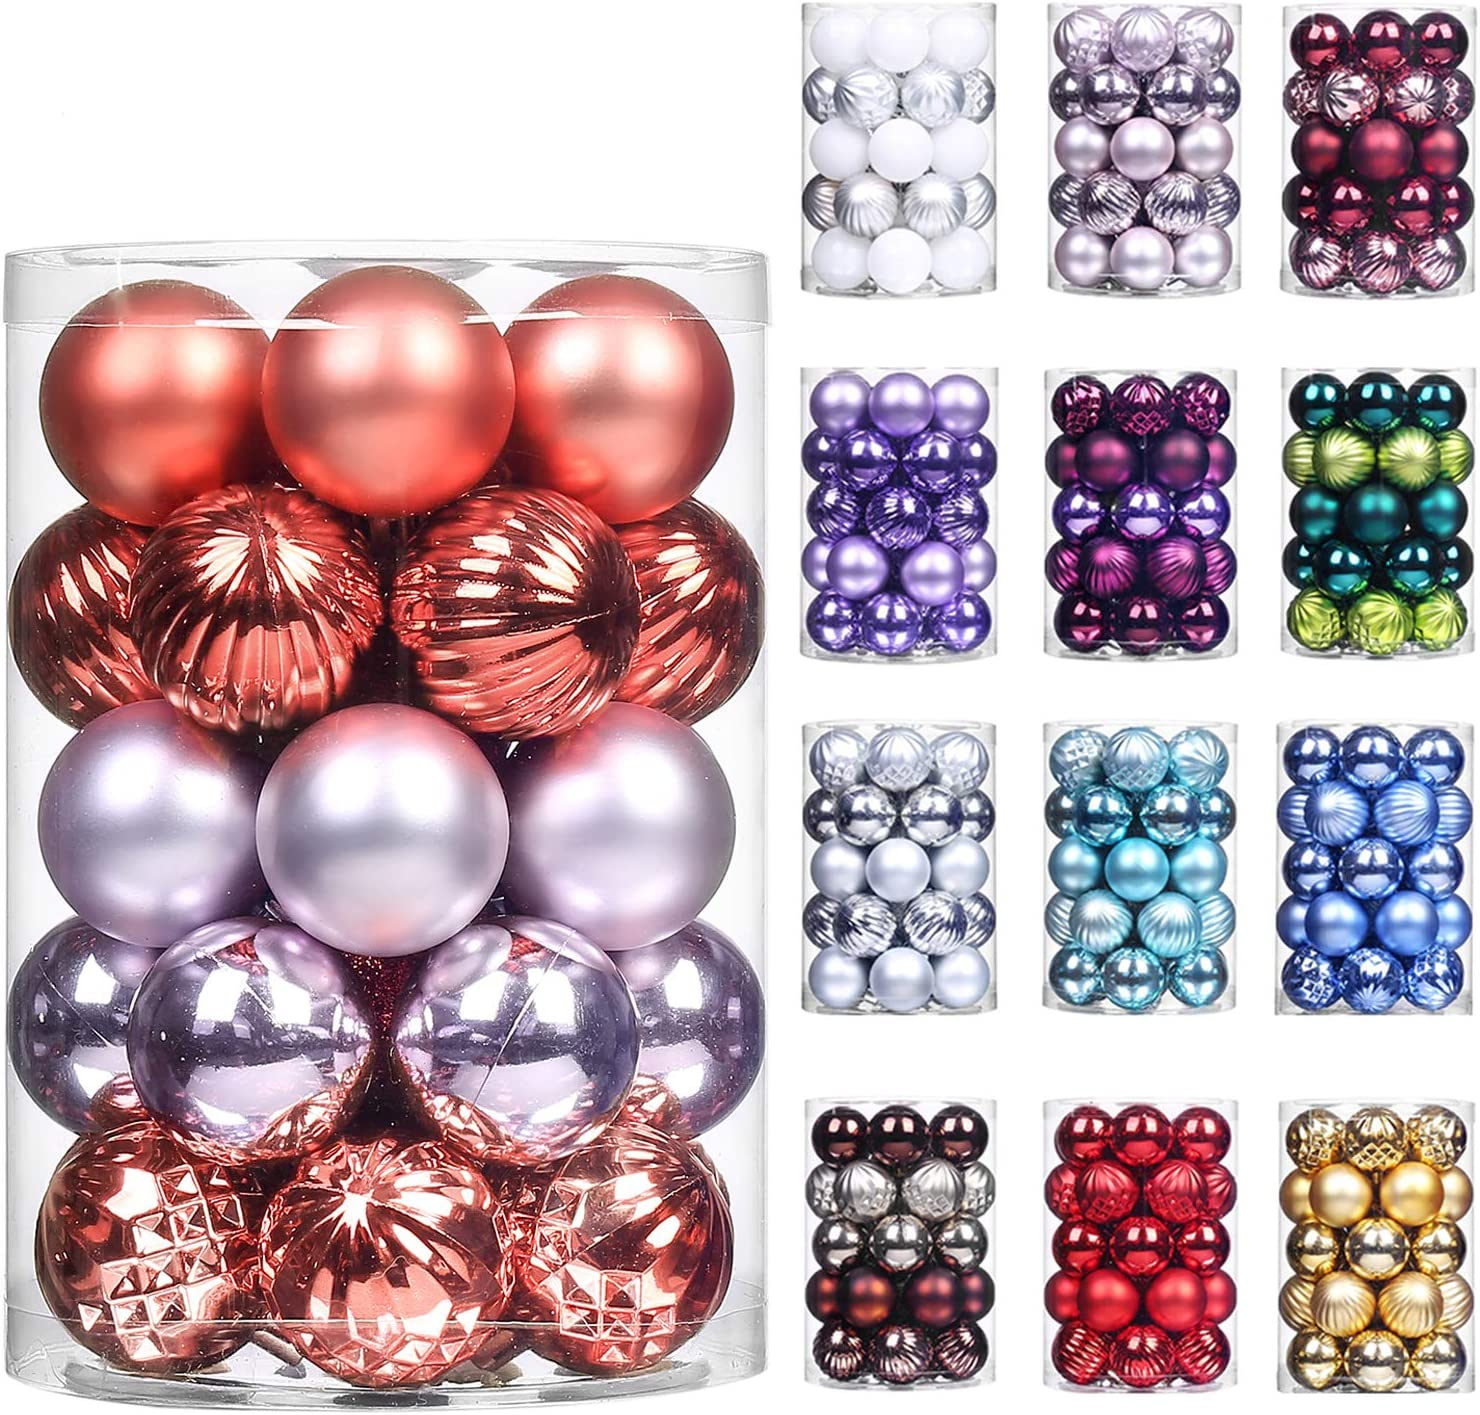 "XmasExp 34ct Christmas Ball Ornaments Shatterproof Christmas Ornaments Set Decorations for Xmas Tree Balls 40mm/1.57"" (1.57'',Coral Red)"